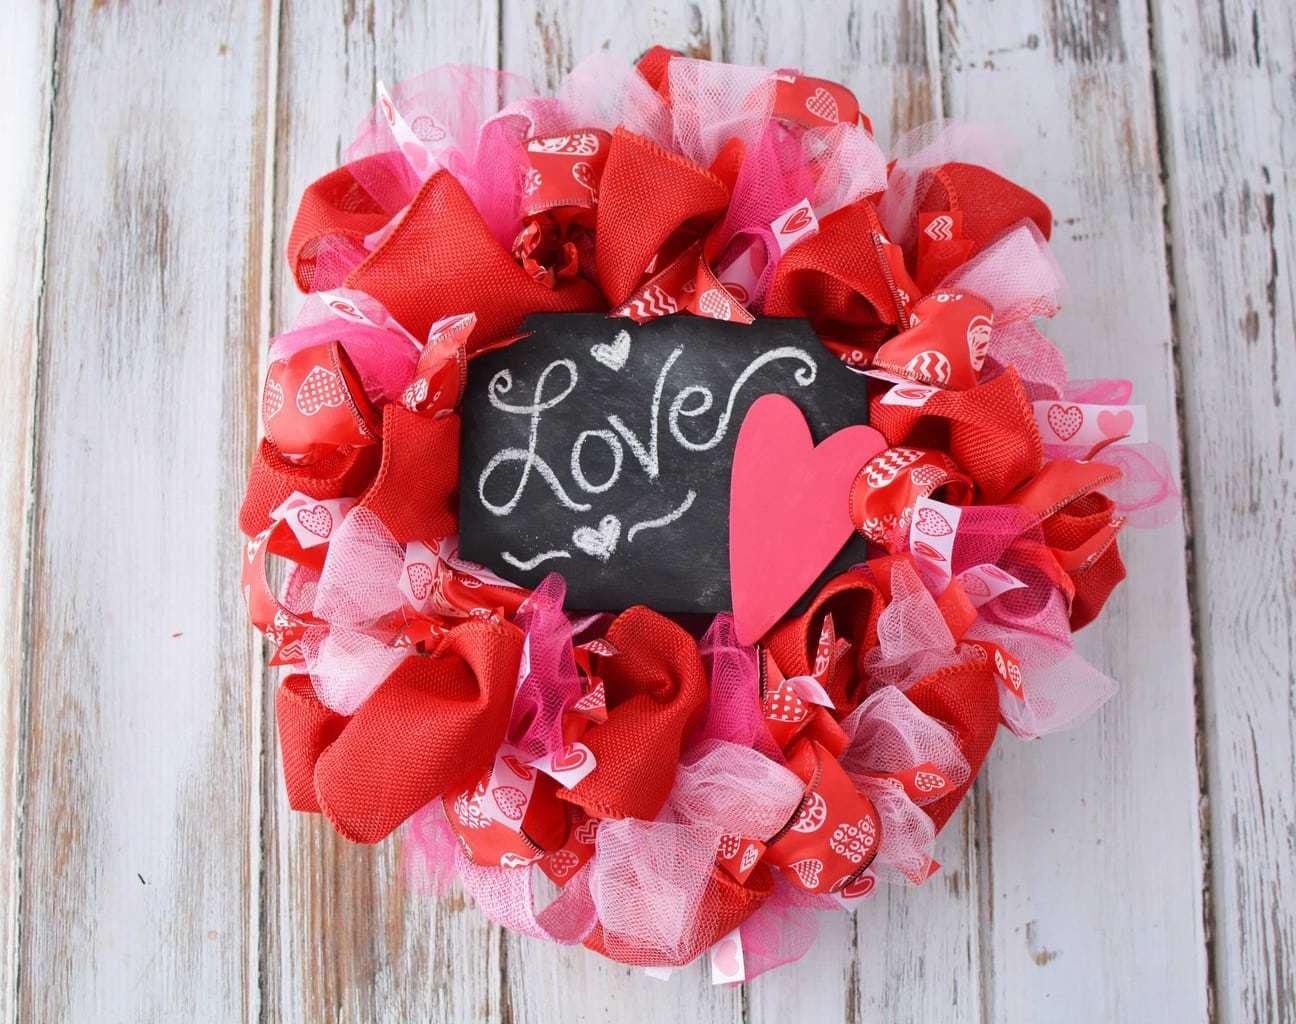 DIY Valentine's Day Wreath, DIY Homemade Wreath, DIY Valentine's Day Wreath, Valentine's Day Crafts